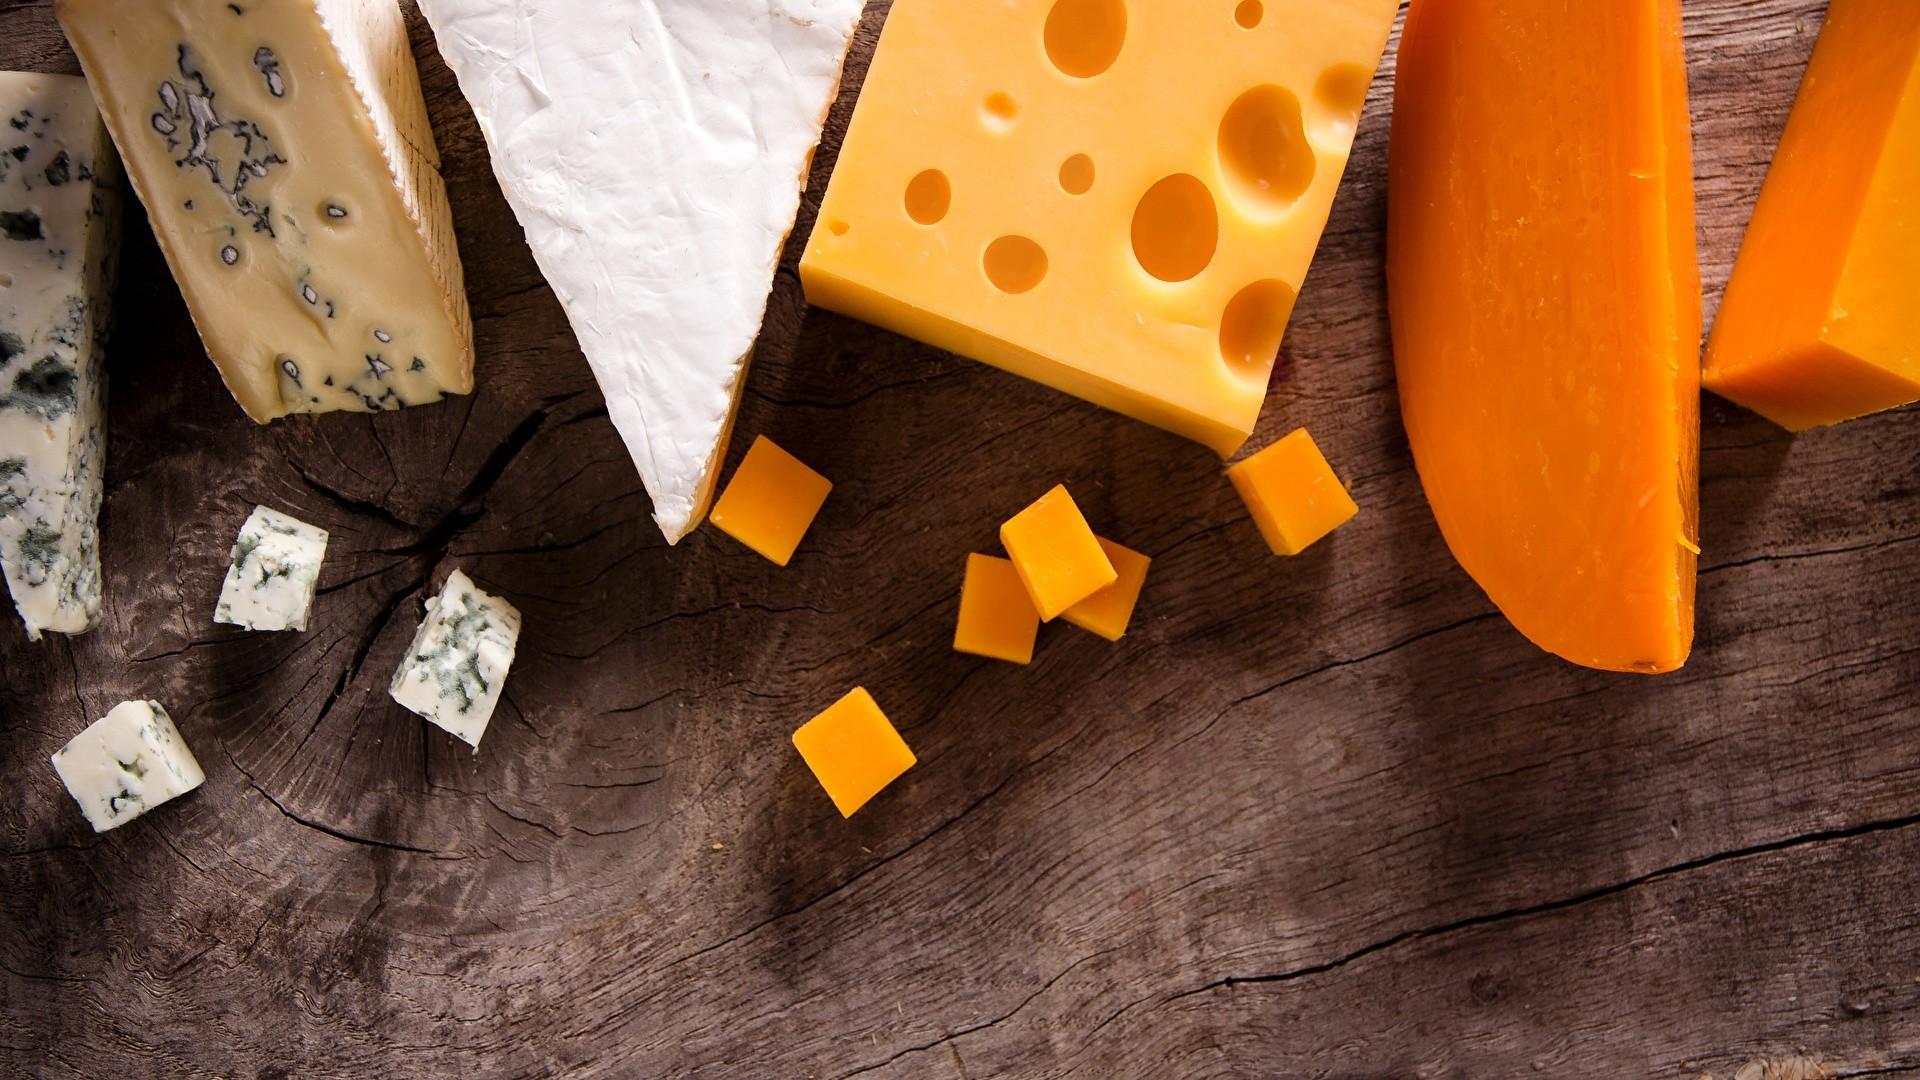 Cheese Wallpaper Full HD